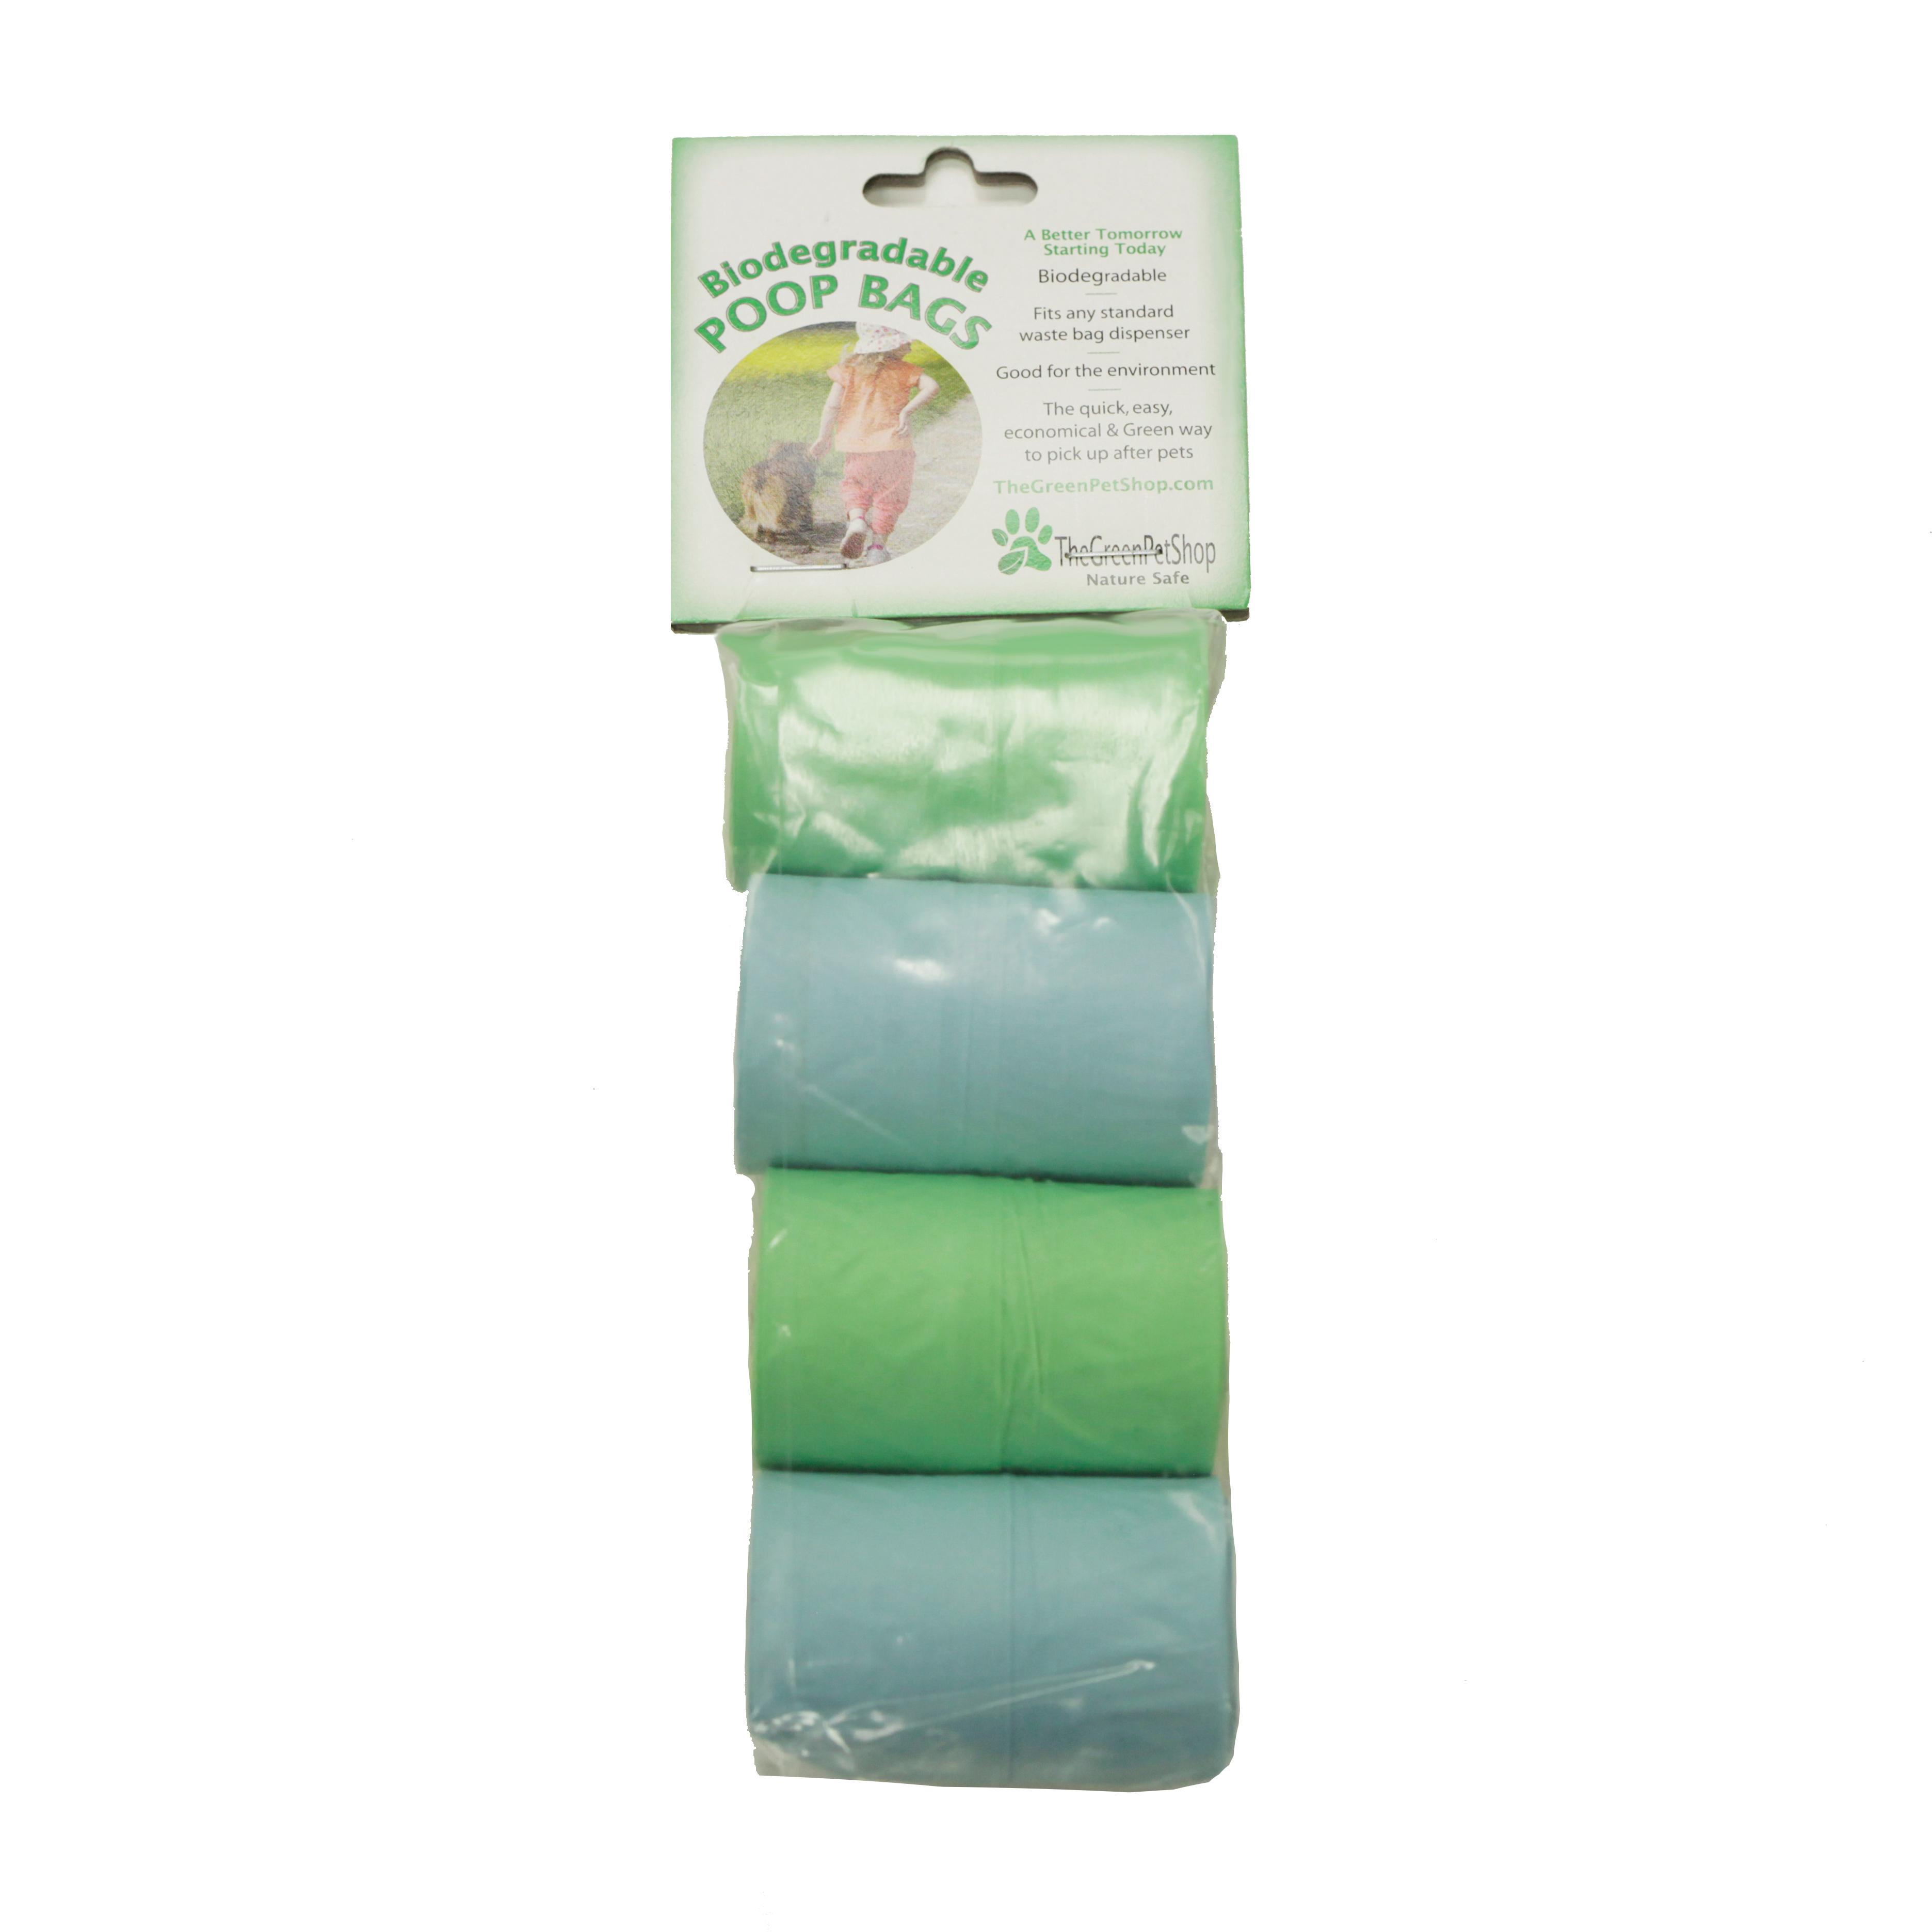 Biodegradable Poop Bag Rolls 4 Rolls